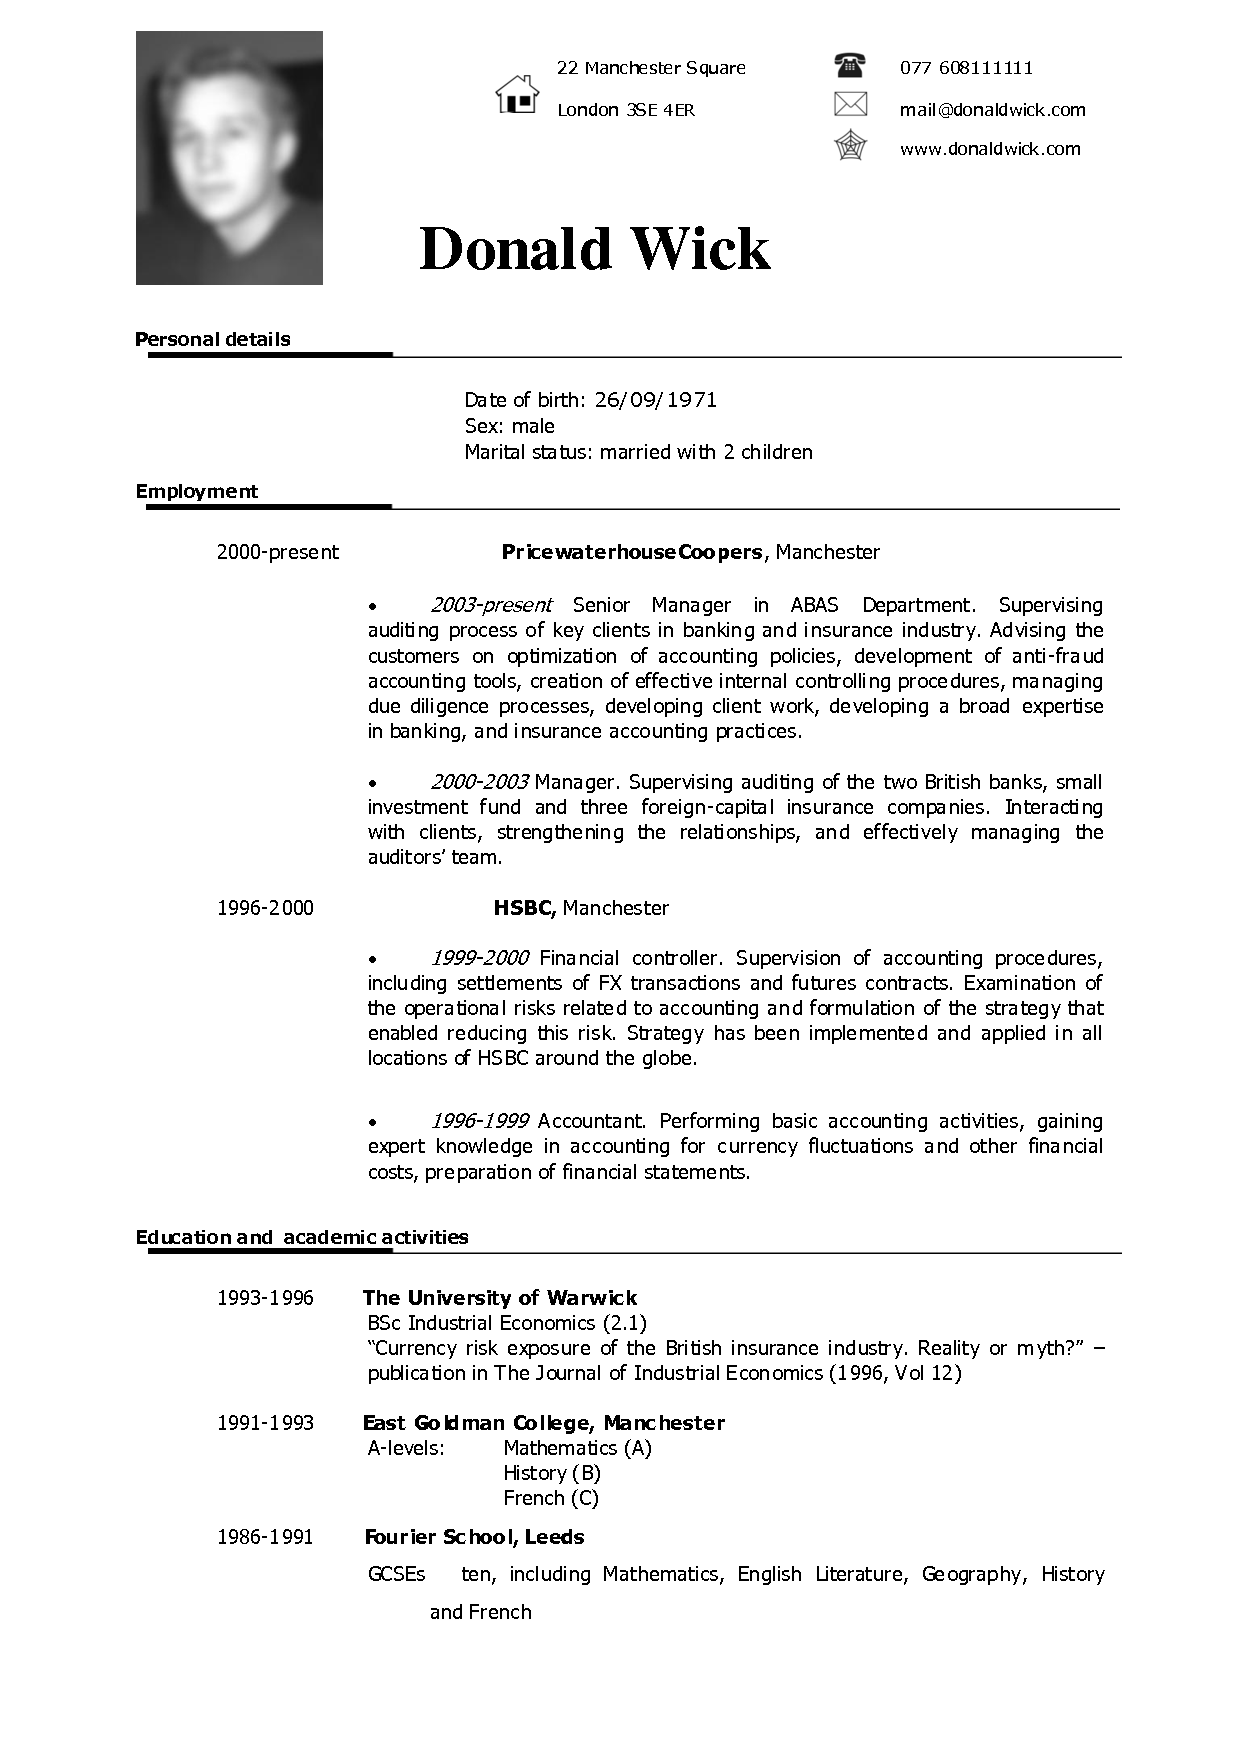 american english for cv resume